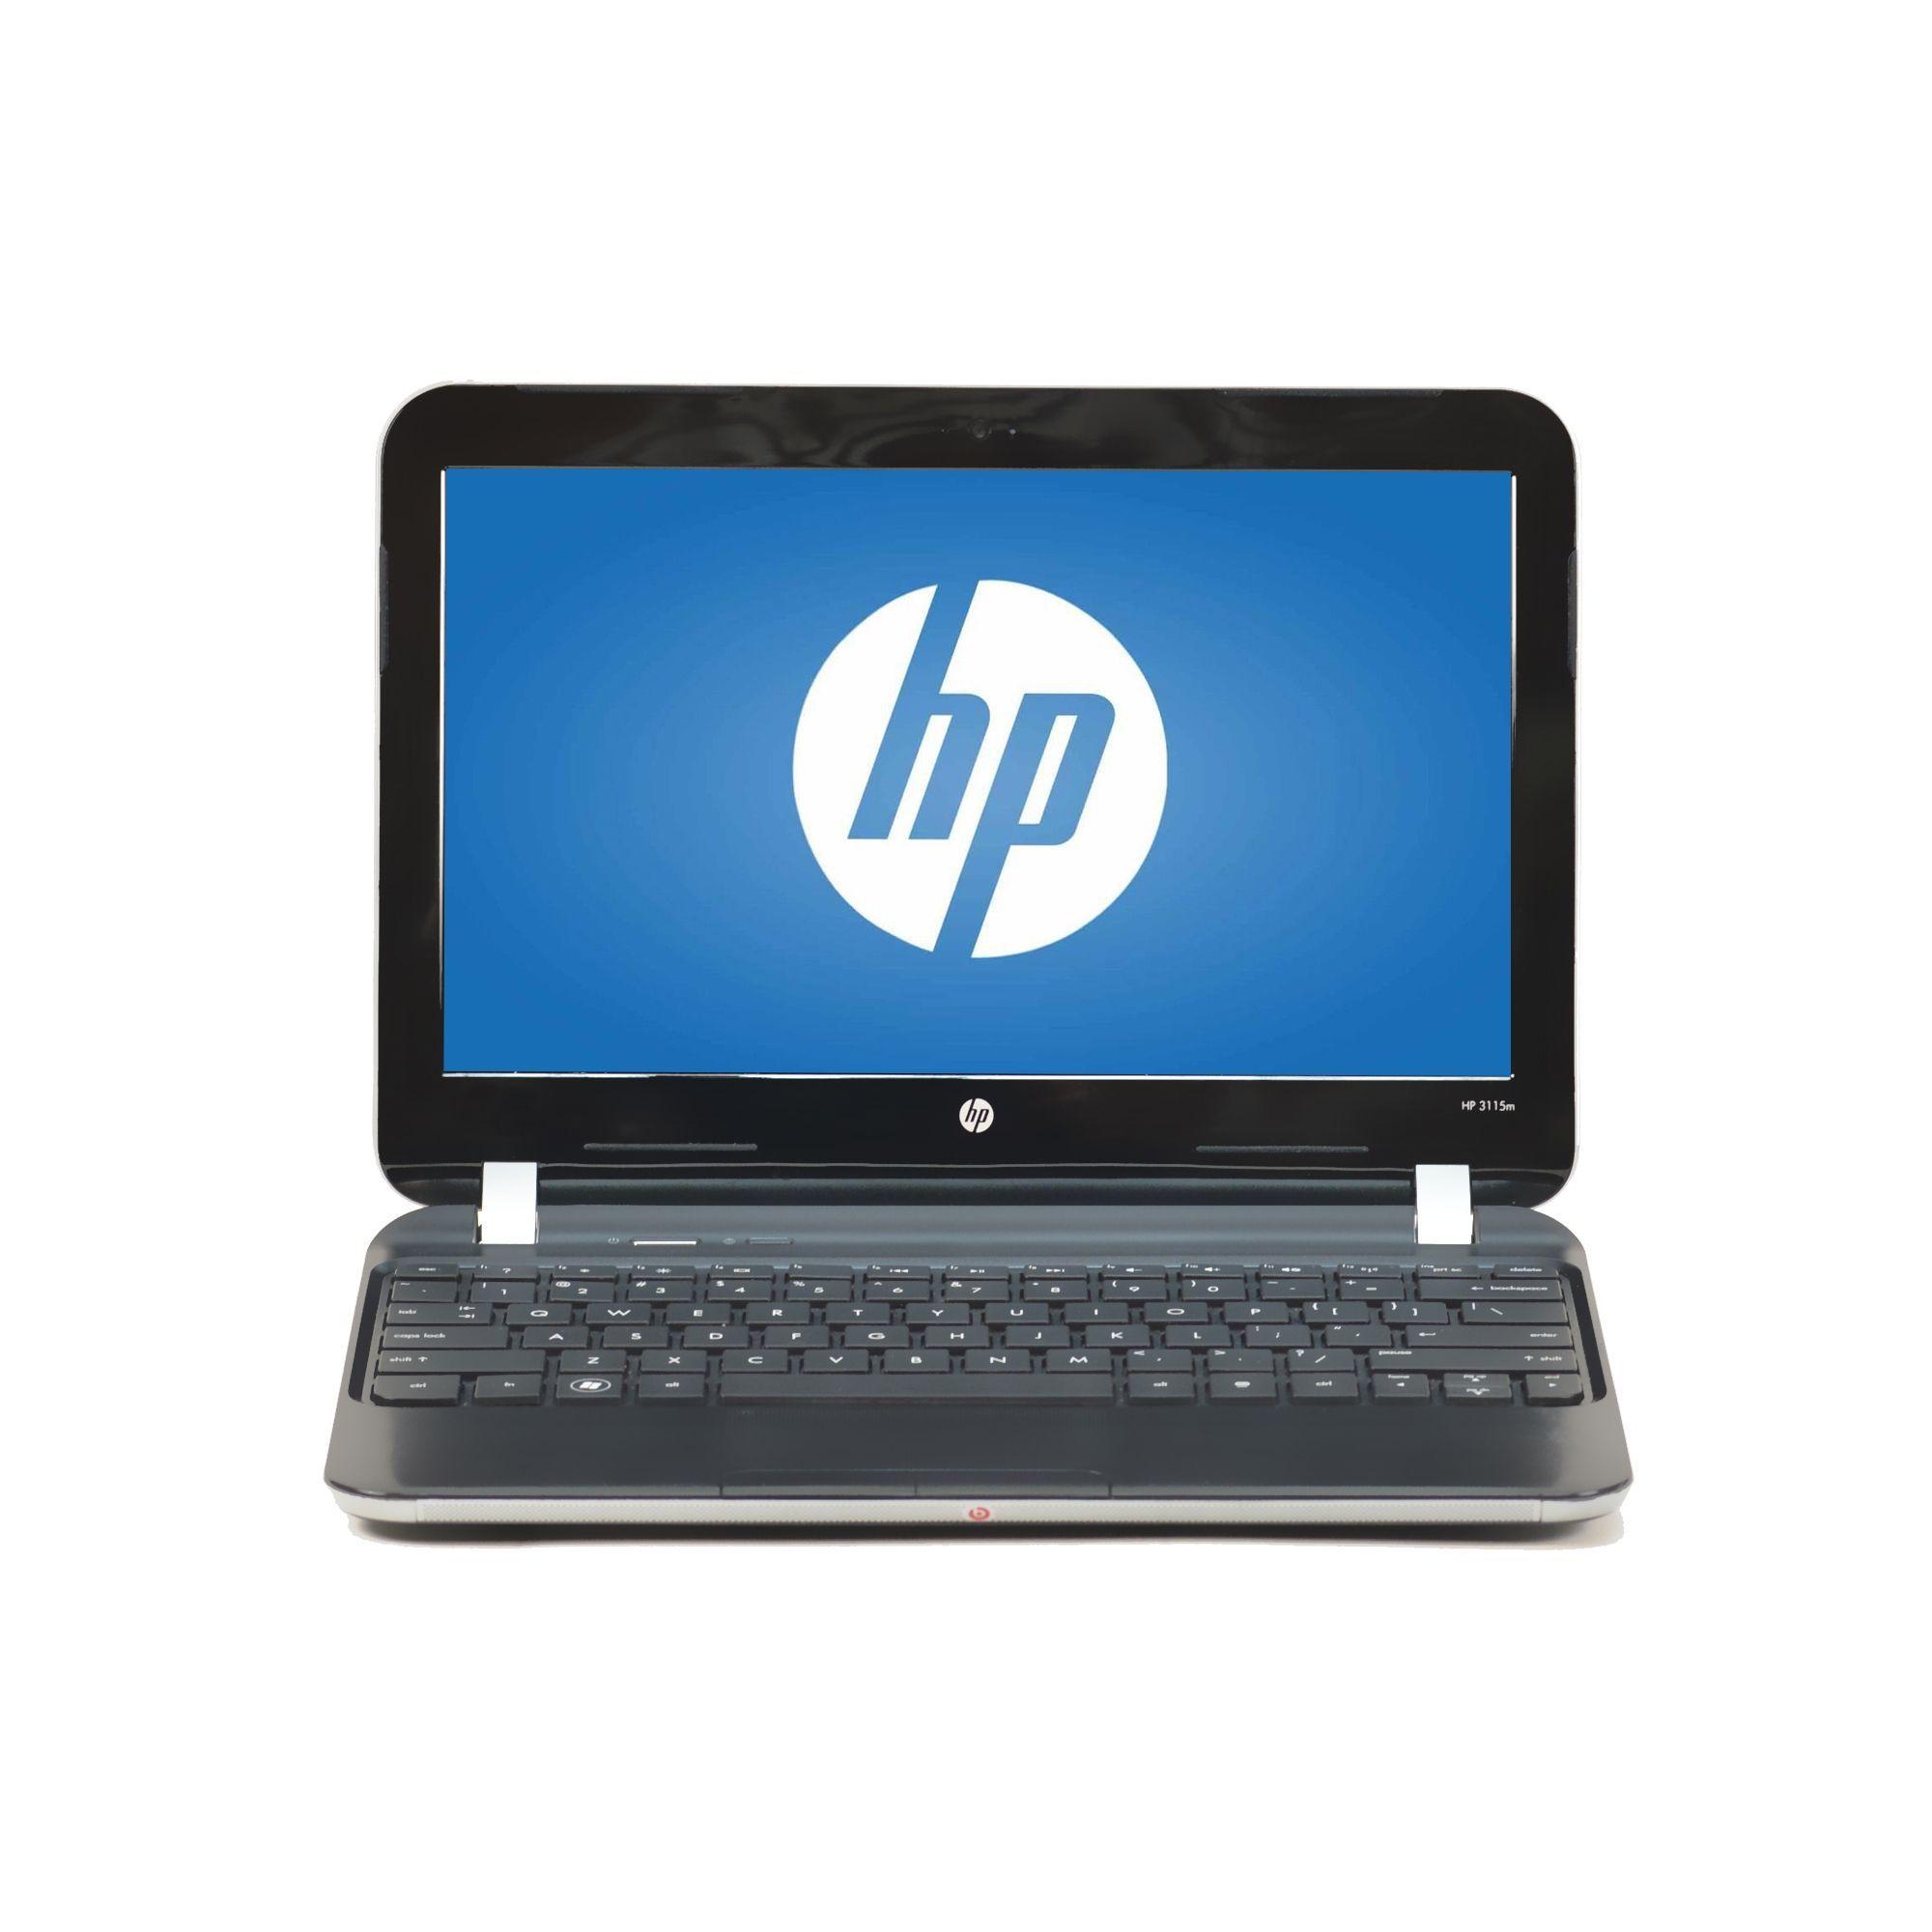 HP 3115M 11.6-inch display 1.65GHz AMD E-450 CPU 4GB RAM 128GB SSD Windows 7 Laptop